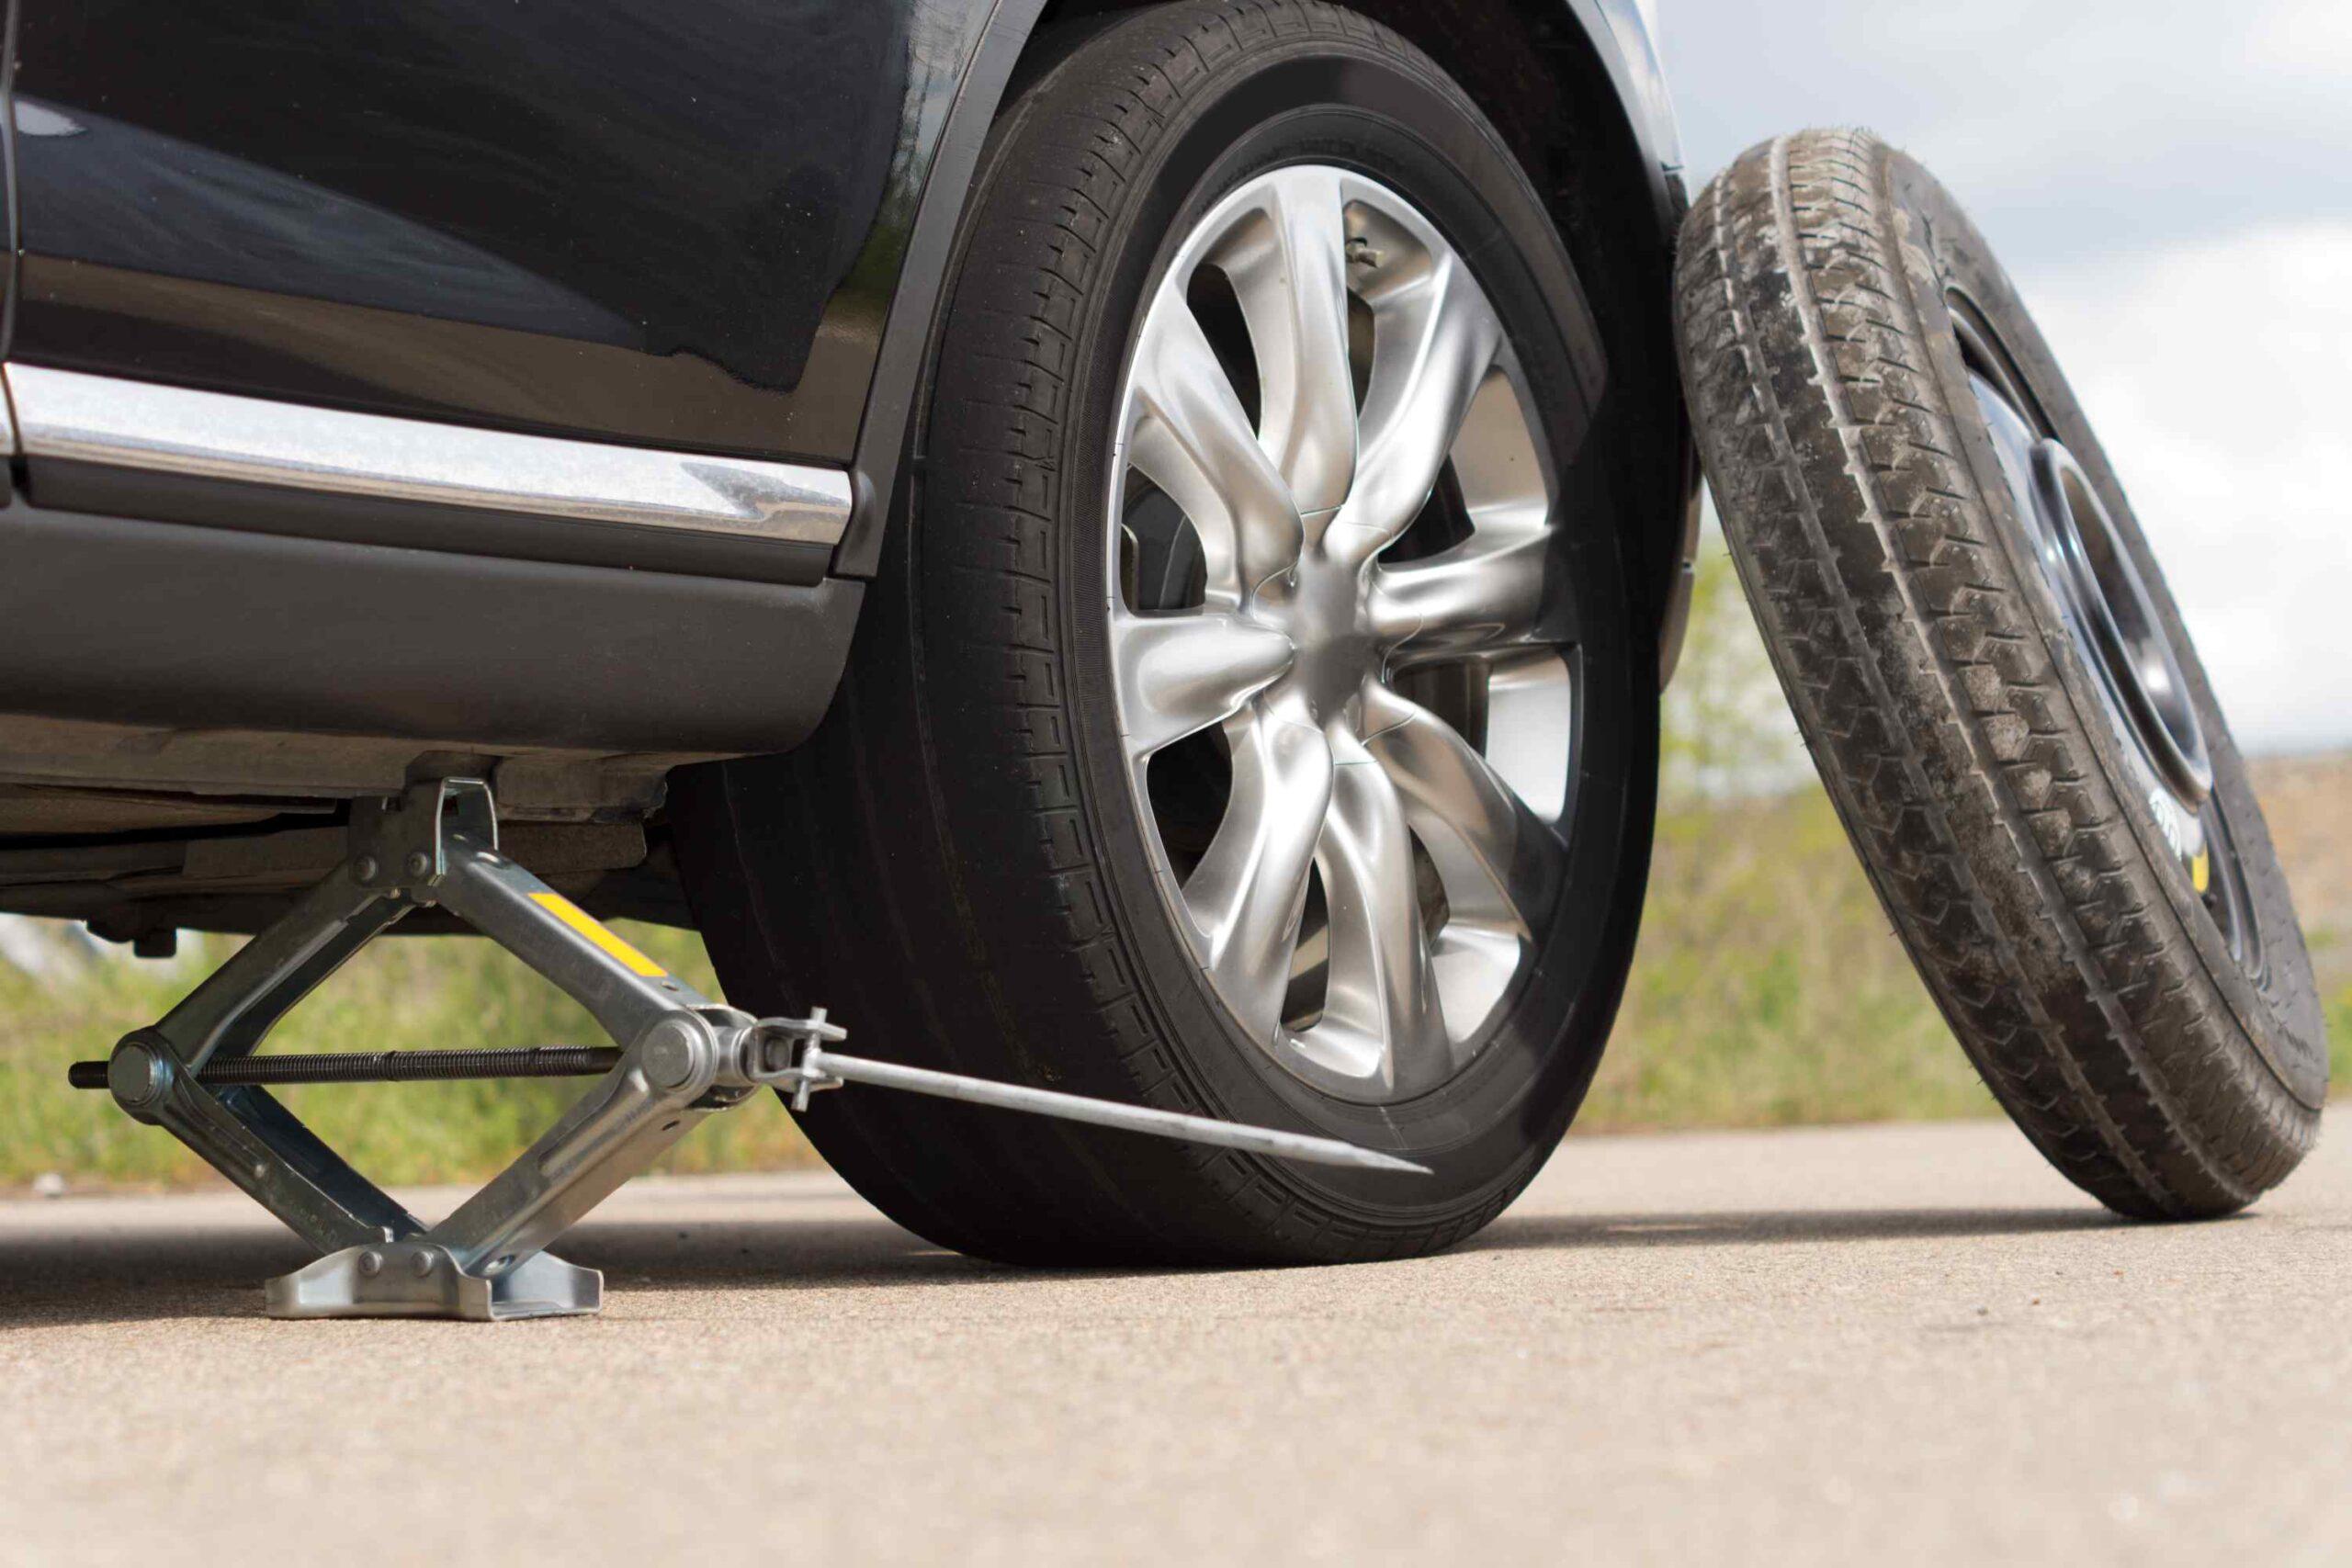 change flat car tire - tire jack